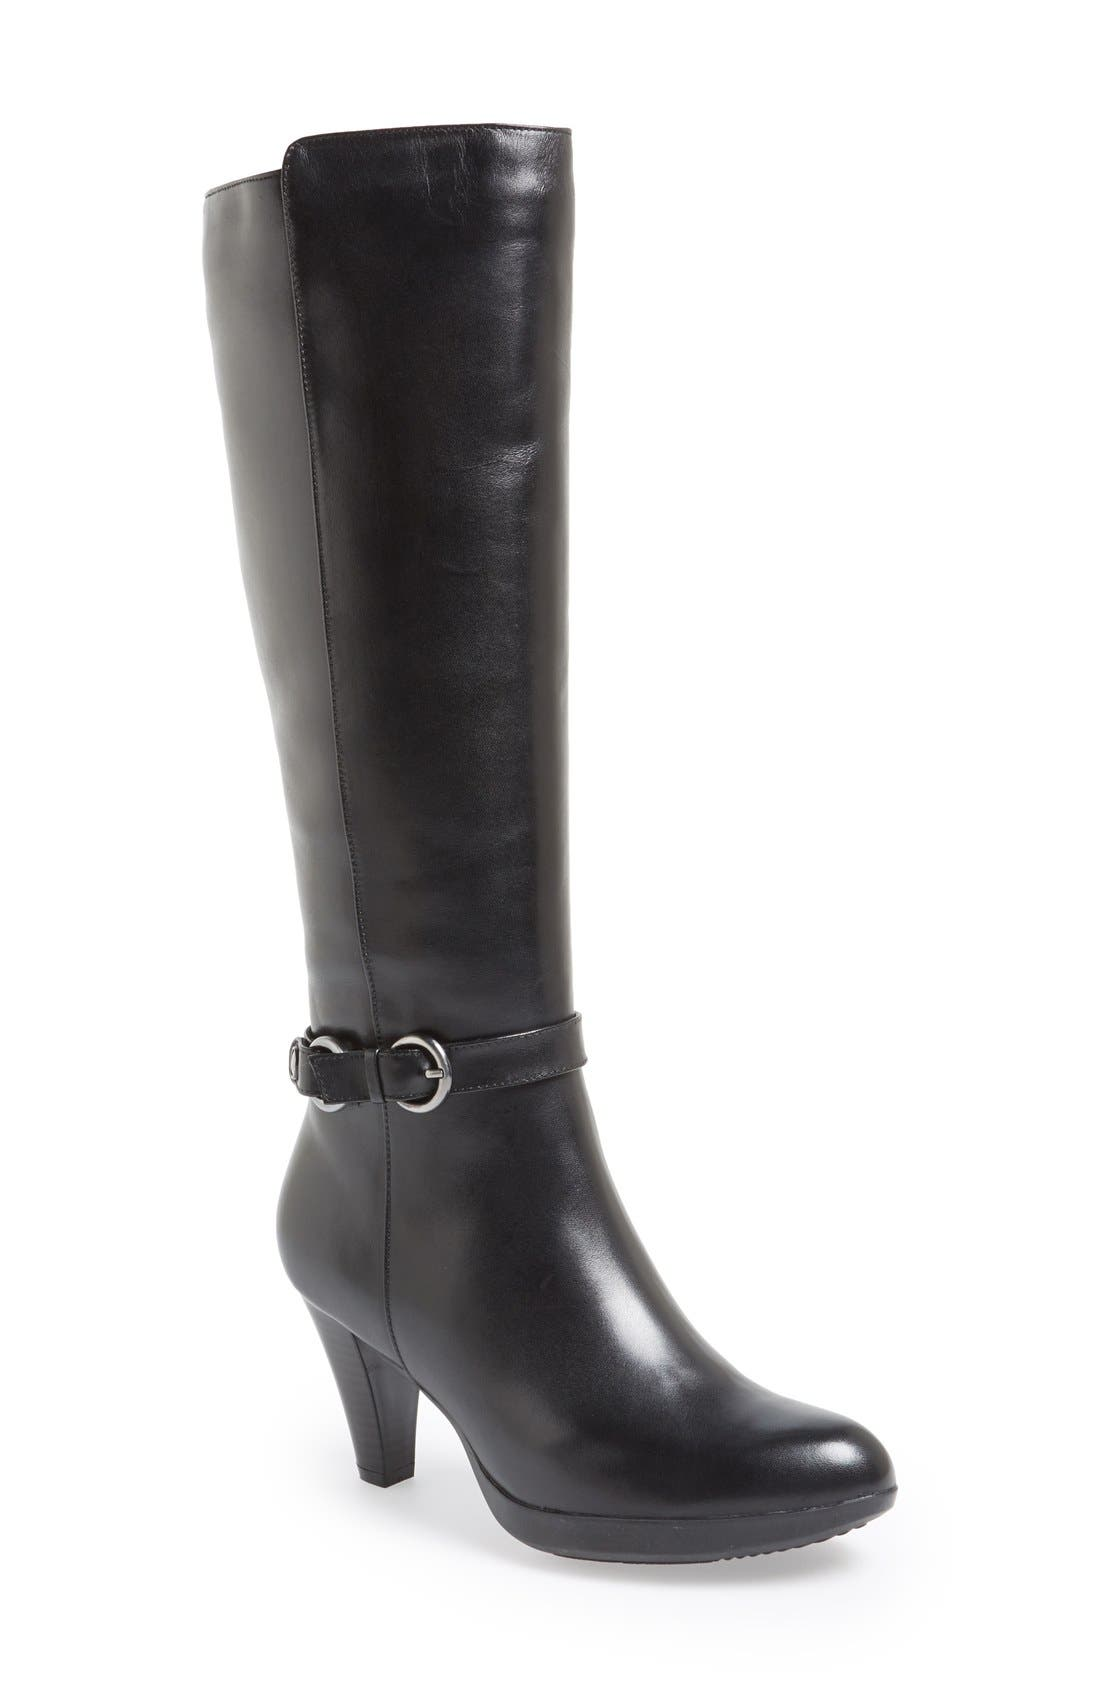 Main Image - Blondo 'Ilanna' Knee High Leather Boot (Women)